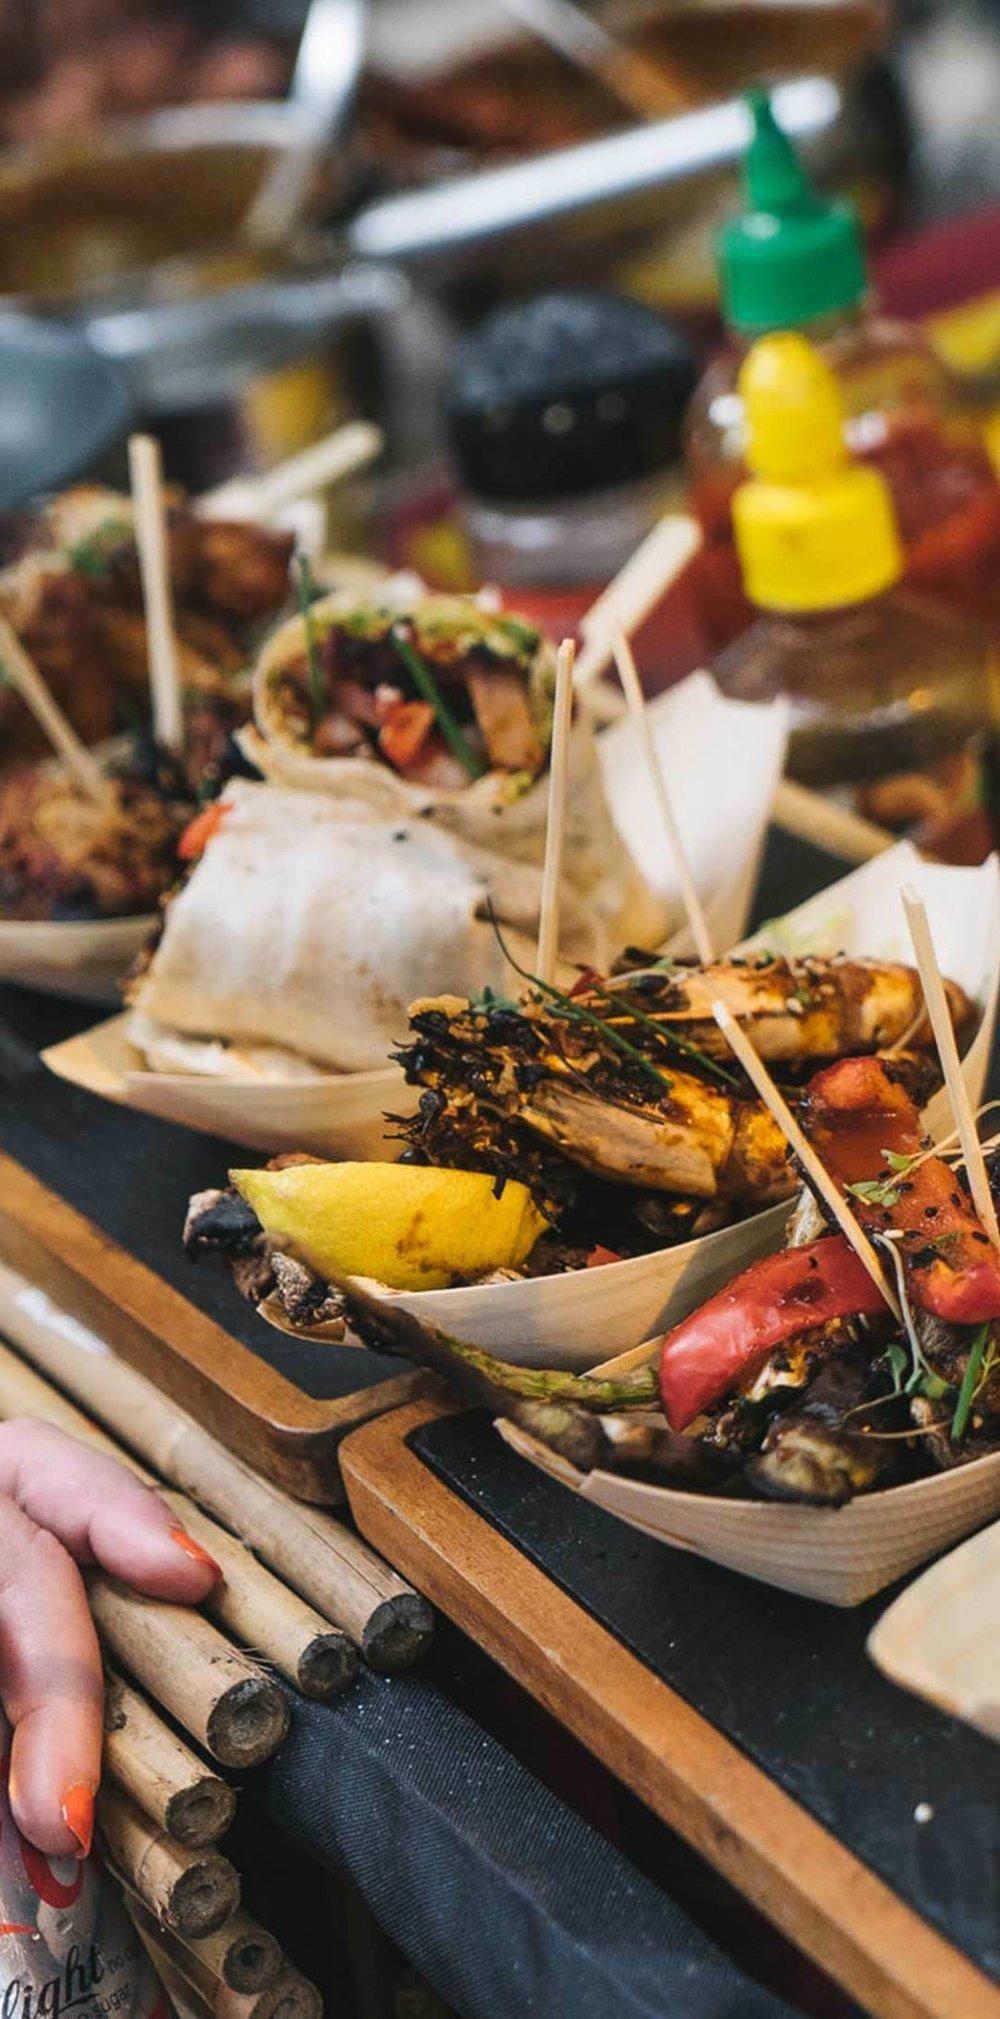 StrawberryToo-Yorkshire Dales Food & Drink Festival9